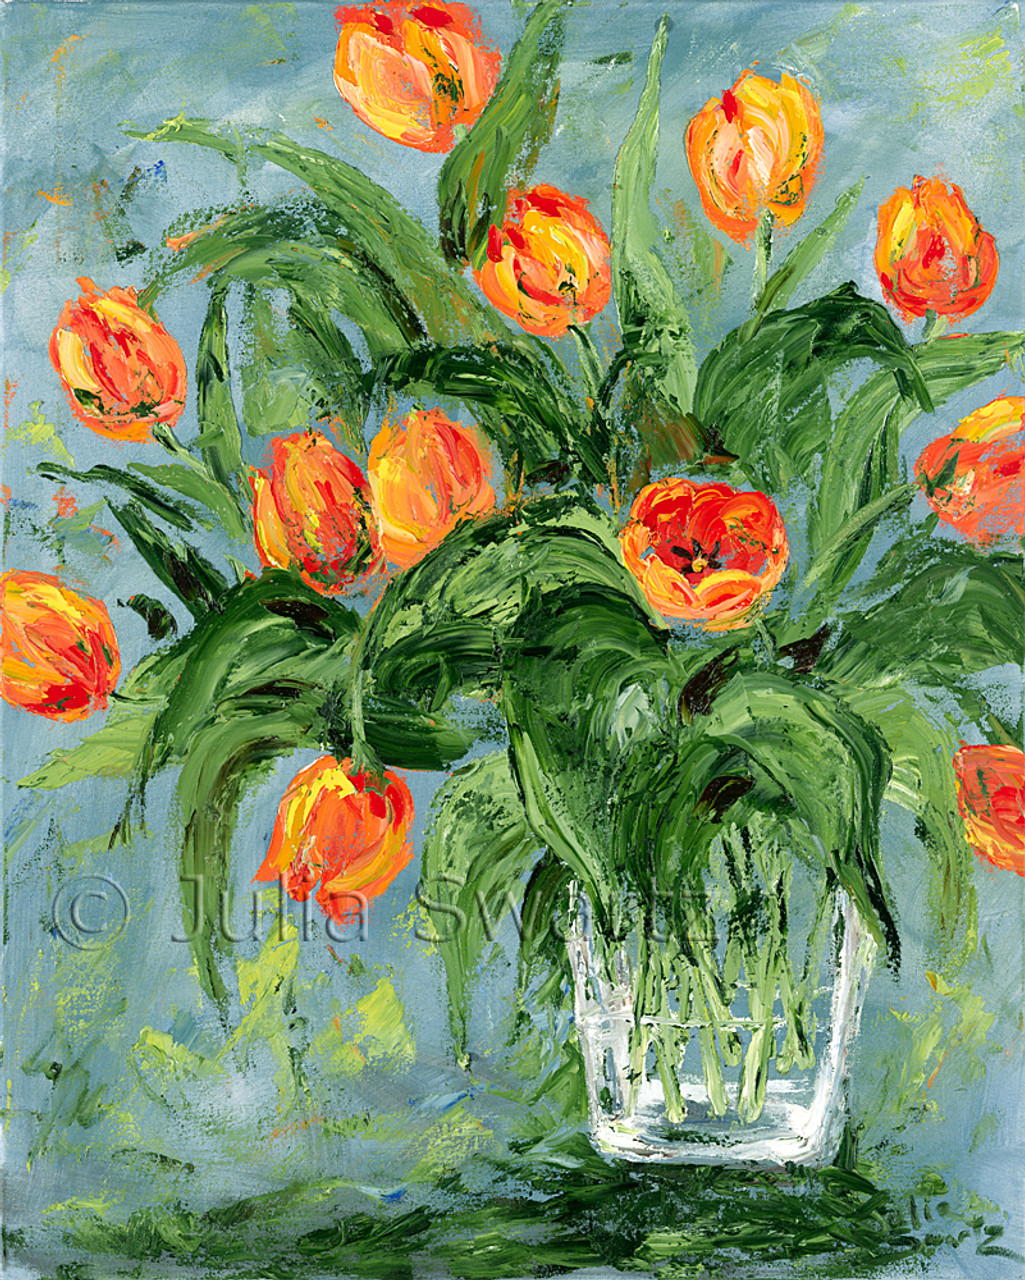 Impressionist Oil Painting : impressionist, painting, Orange, Spring, Tulips, Flower, Painting